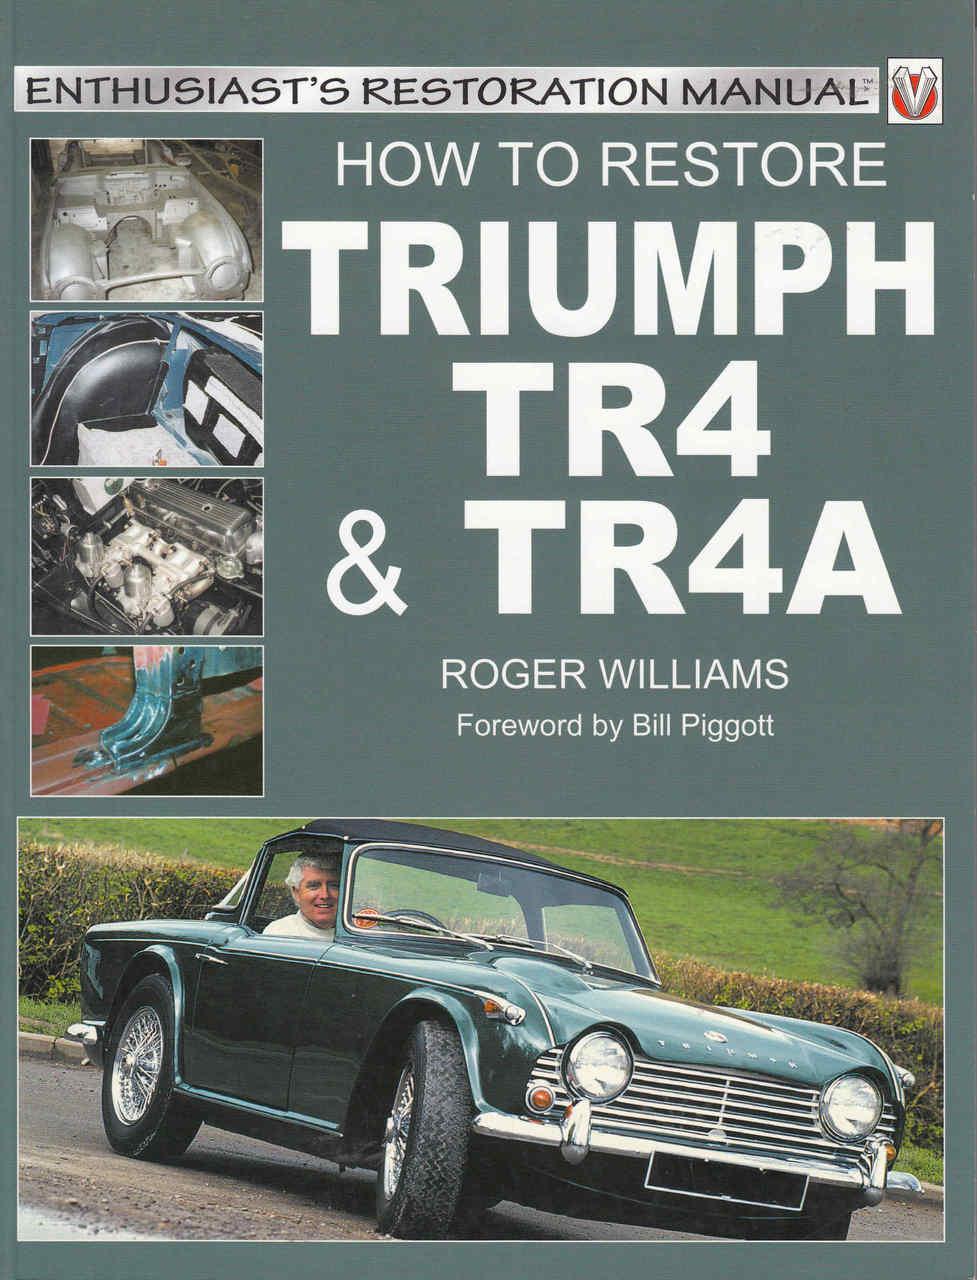 how to restore triumph tr4 tr4a enthusiast s restoration manual rh automotobookshop com au triumph tr4 manual pdf triumph tr4 workshop manual pdf